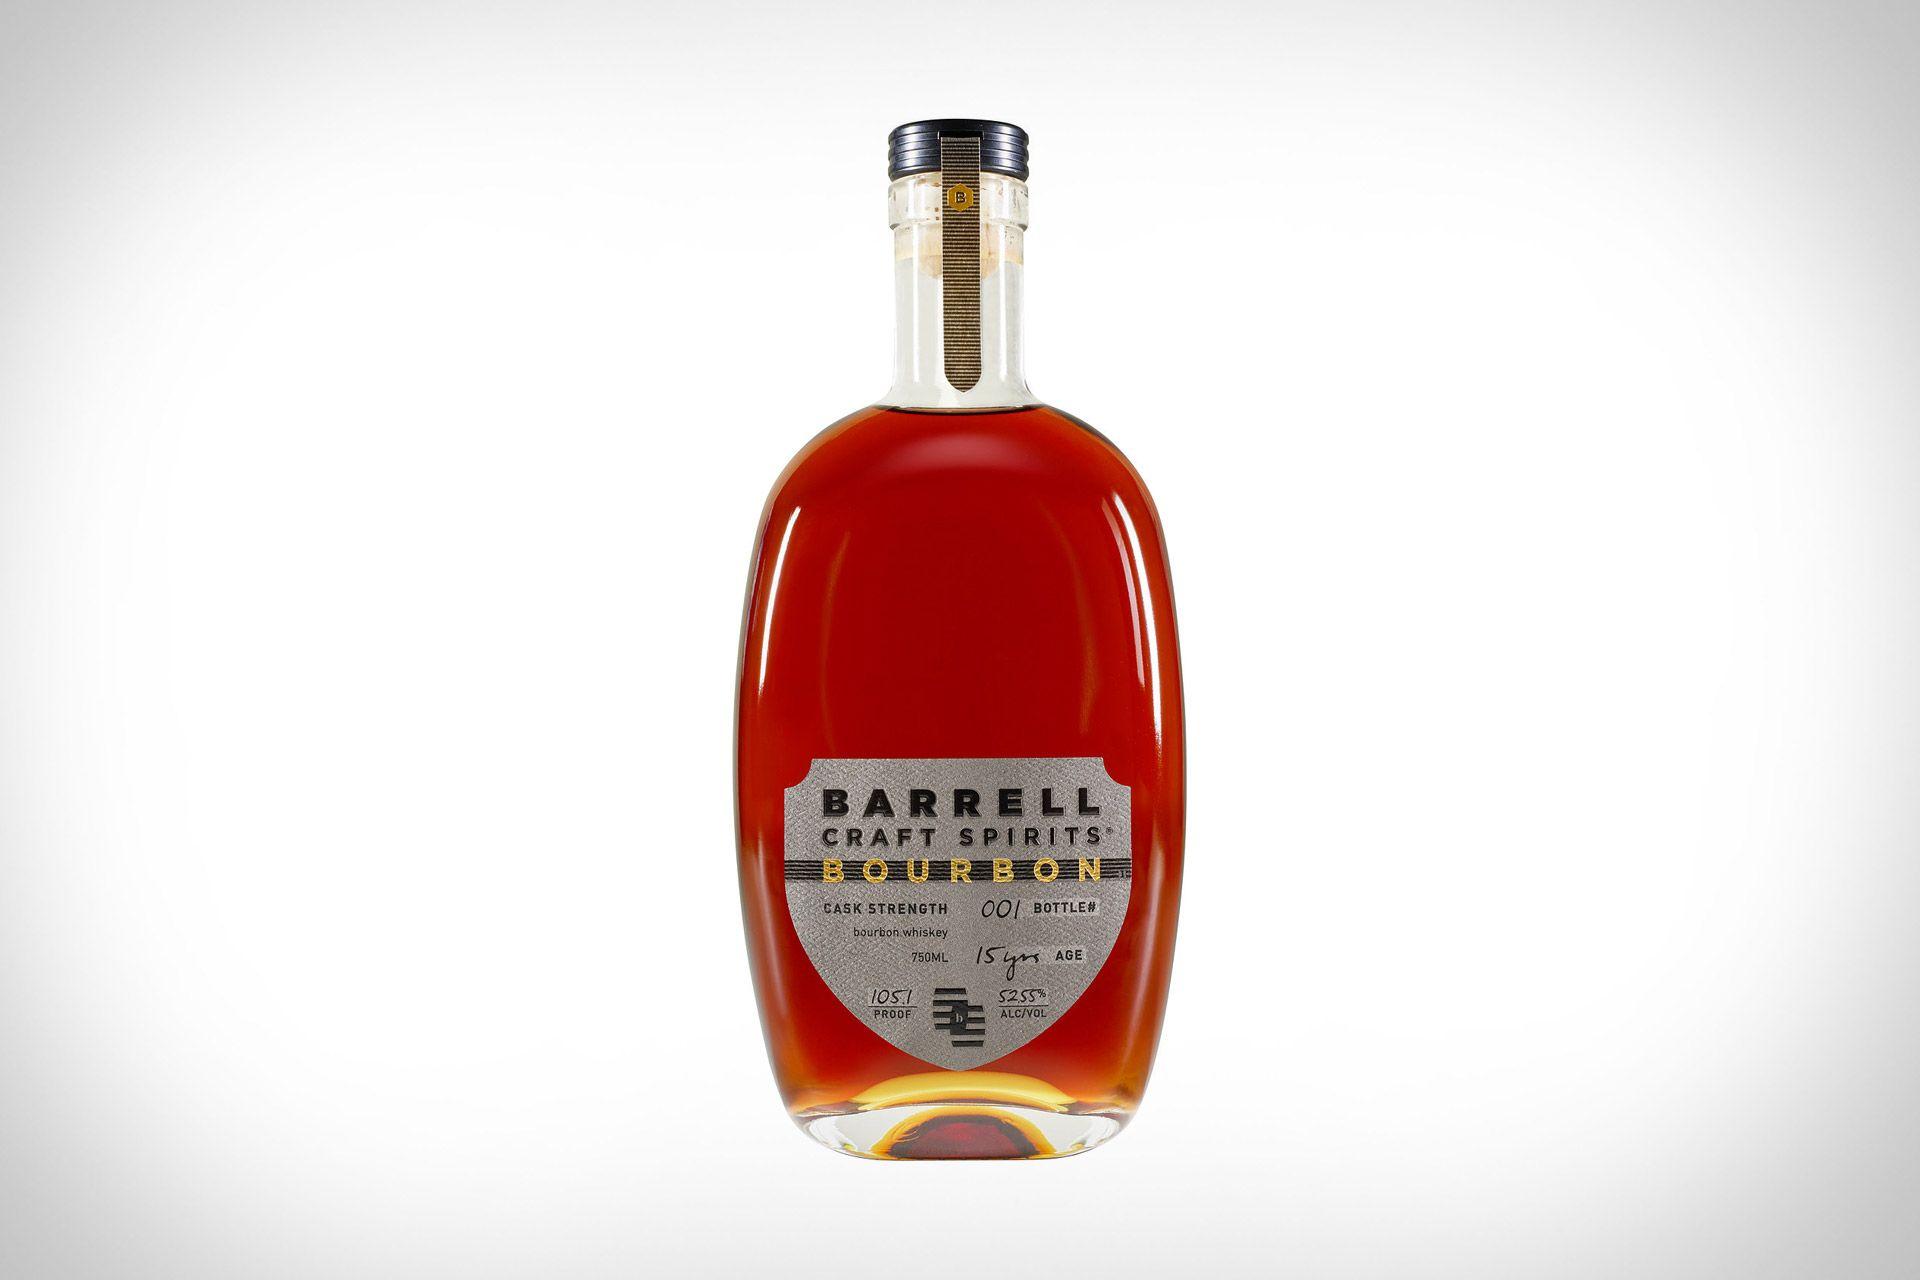 Barrell Craft Spirits 15 Year Old Bourbon Craft Spirits Bourbon Spirit